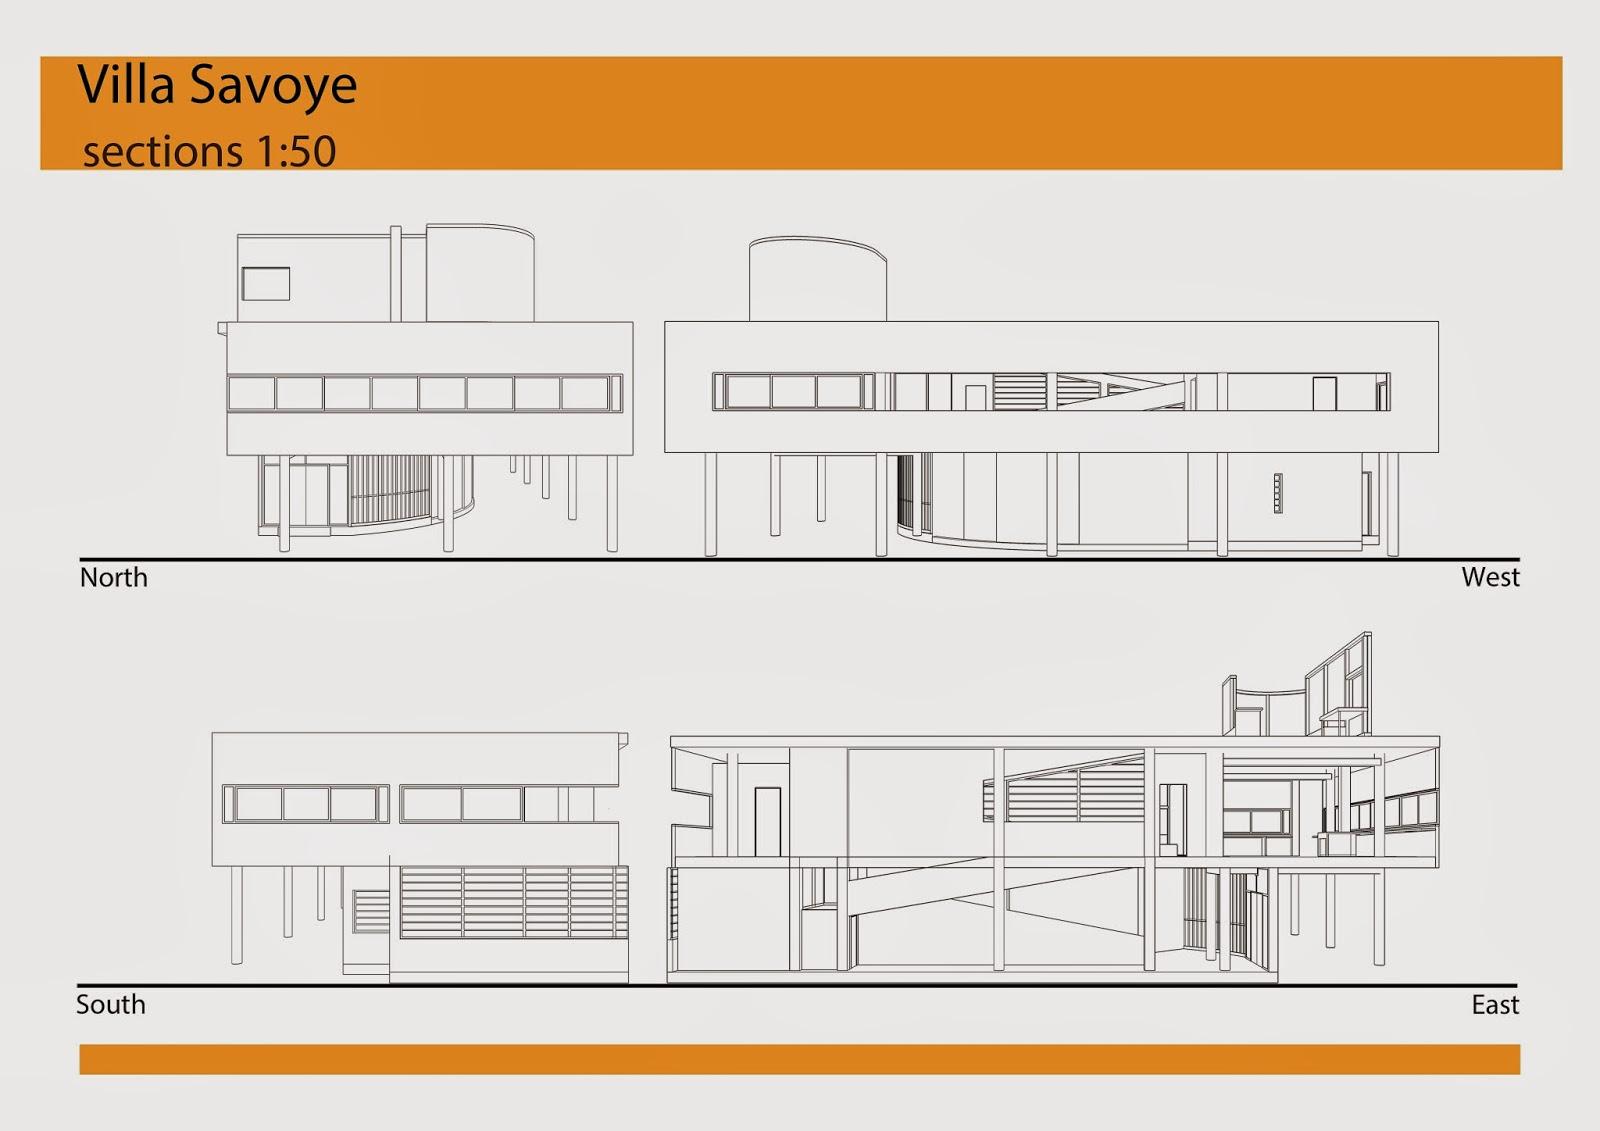 Villa Elevation Plan : Villa savoye plans and sections